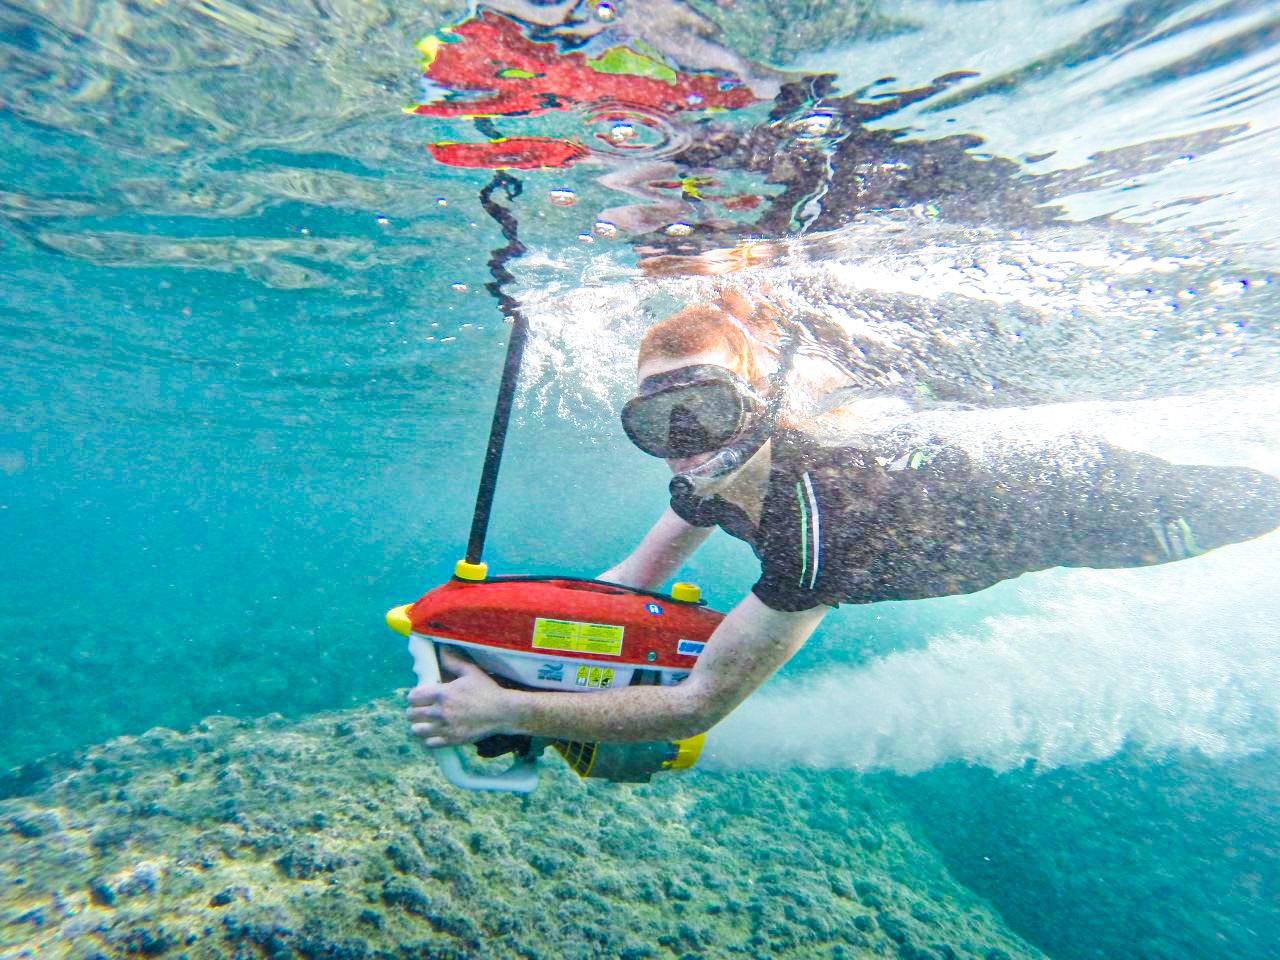 Aquascooter | HobbyLand | הובילנד